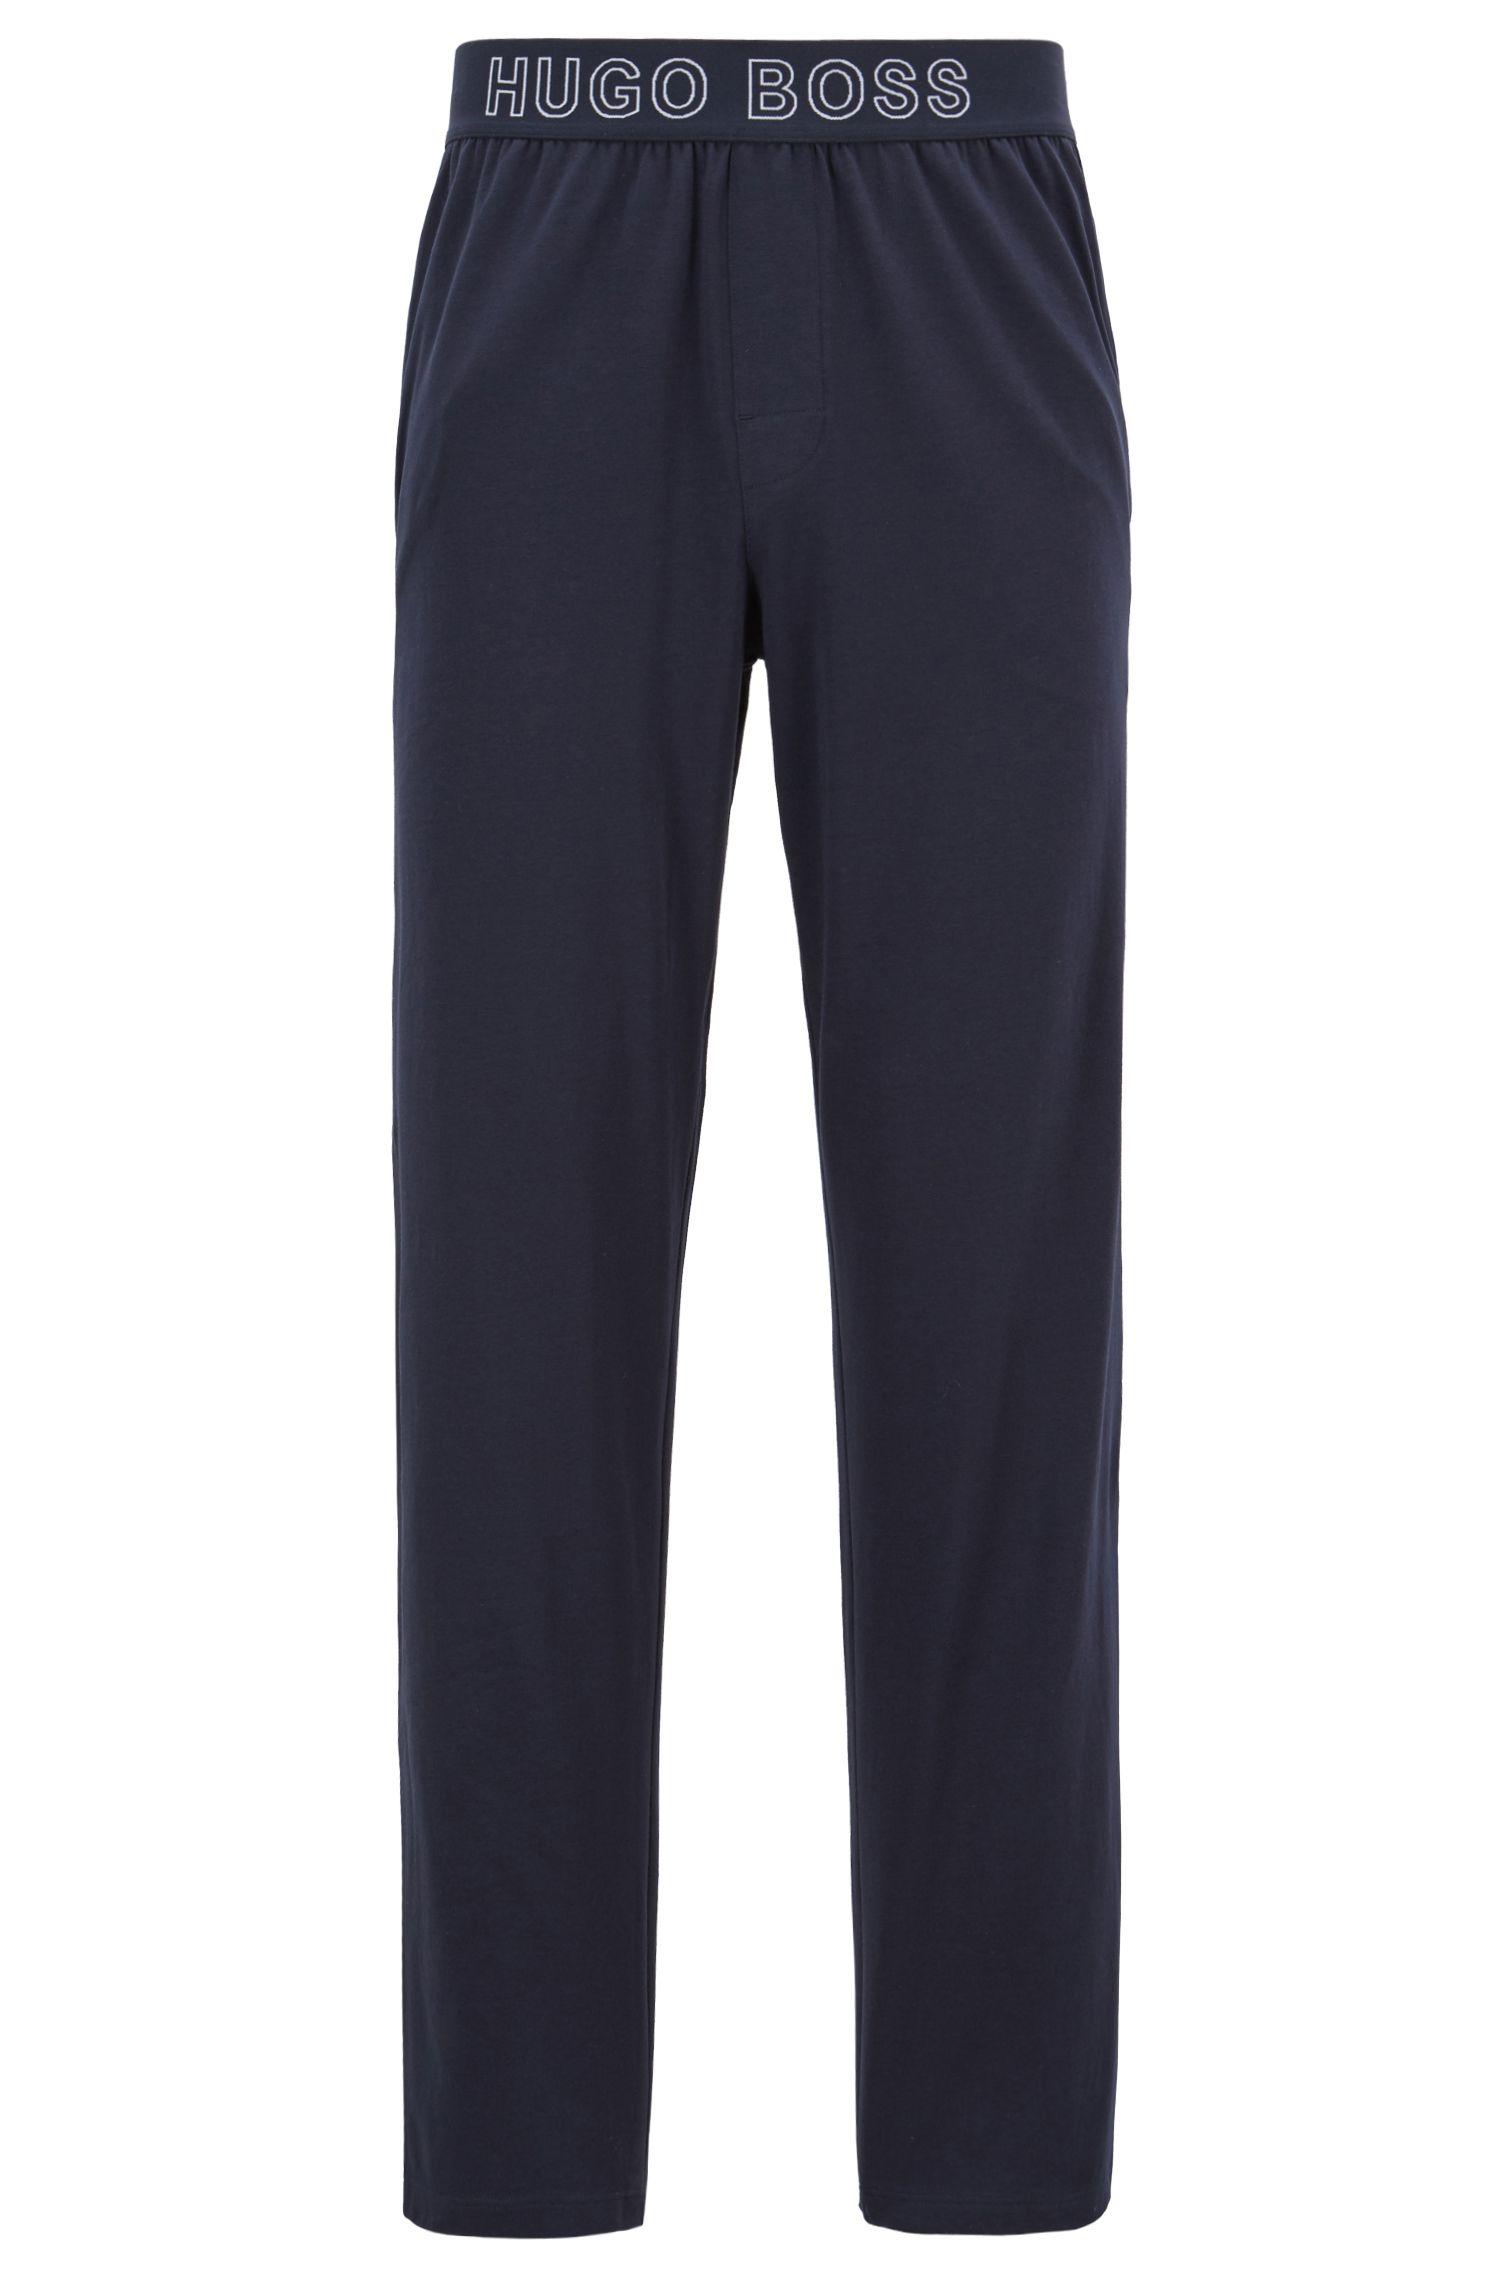 Pyjama-Hose aus Jersey mit Jacquard-Logo am Bund, Dunkelblau